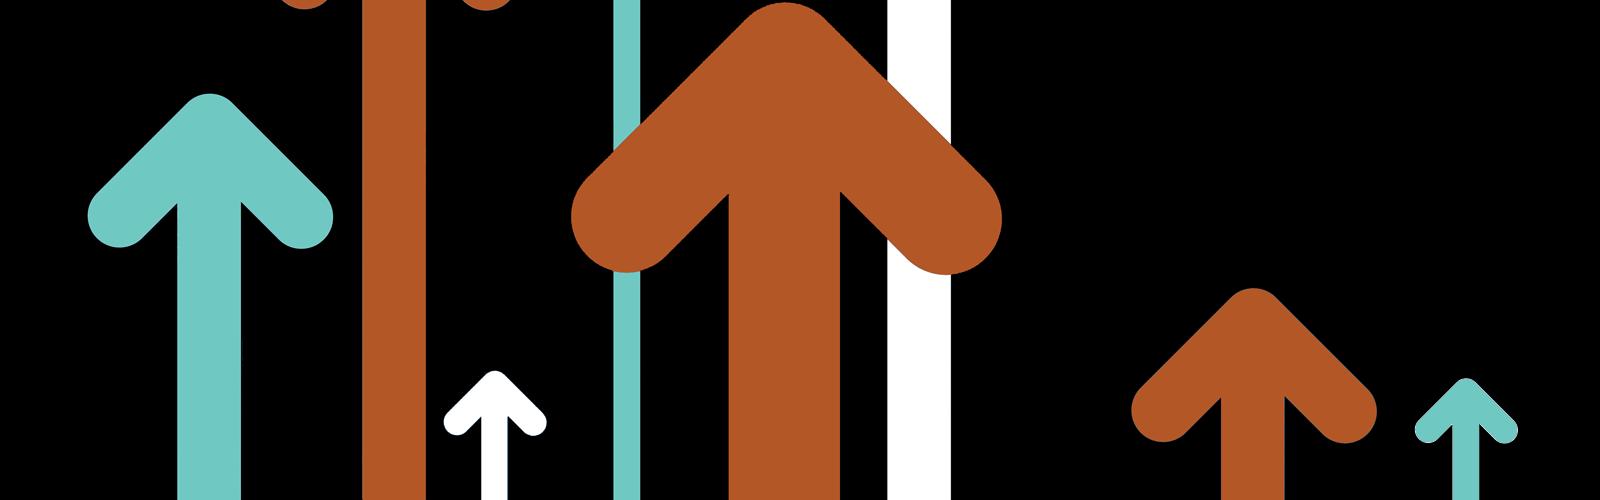 CM-LK03575-Matton-omgjord-pilar